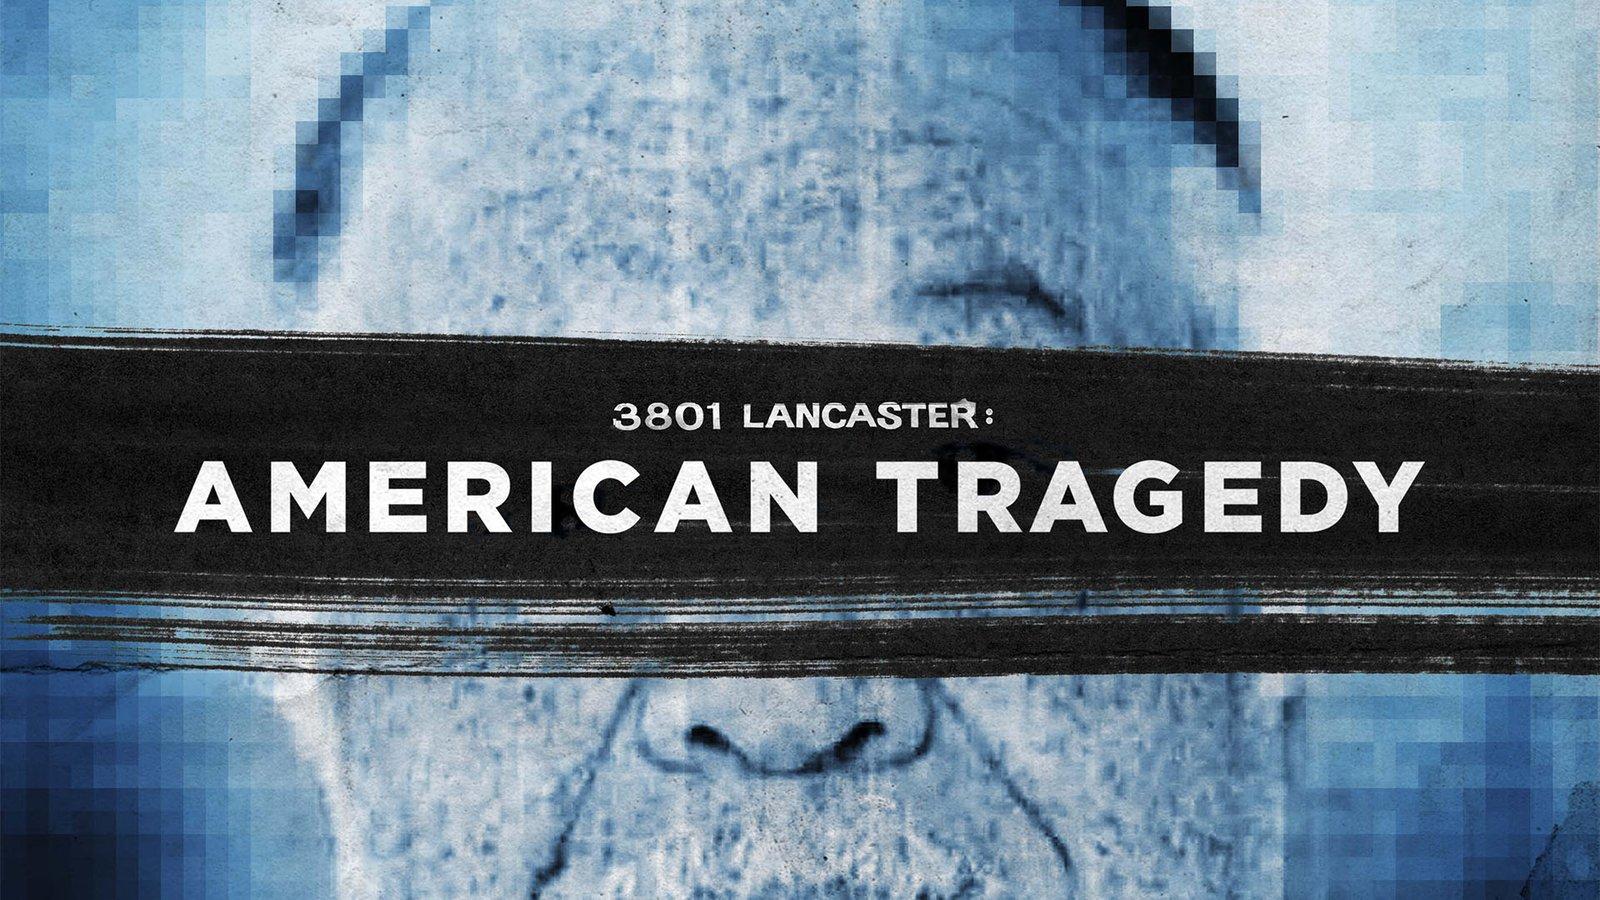 3801 Lancaster: American Tragedy - The Secret Crimes of Abortionist Dr. Kermit Gosnell